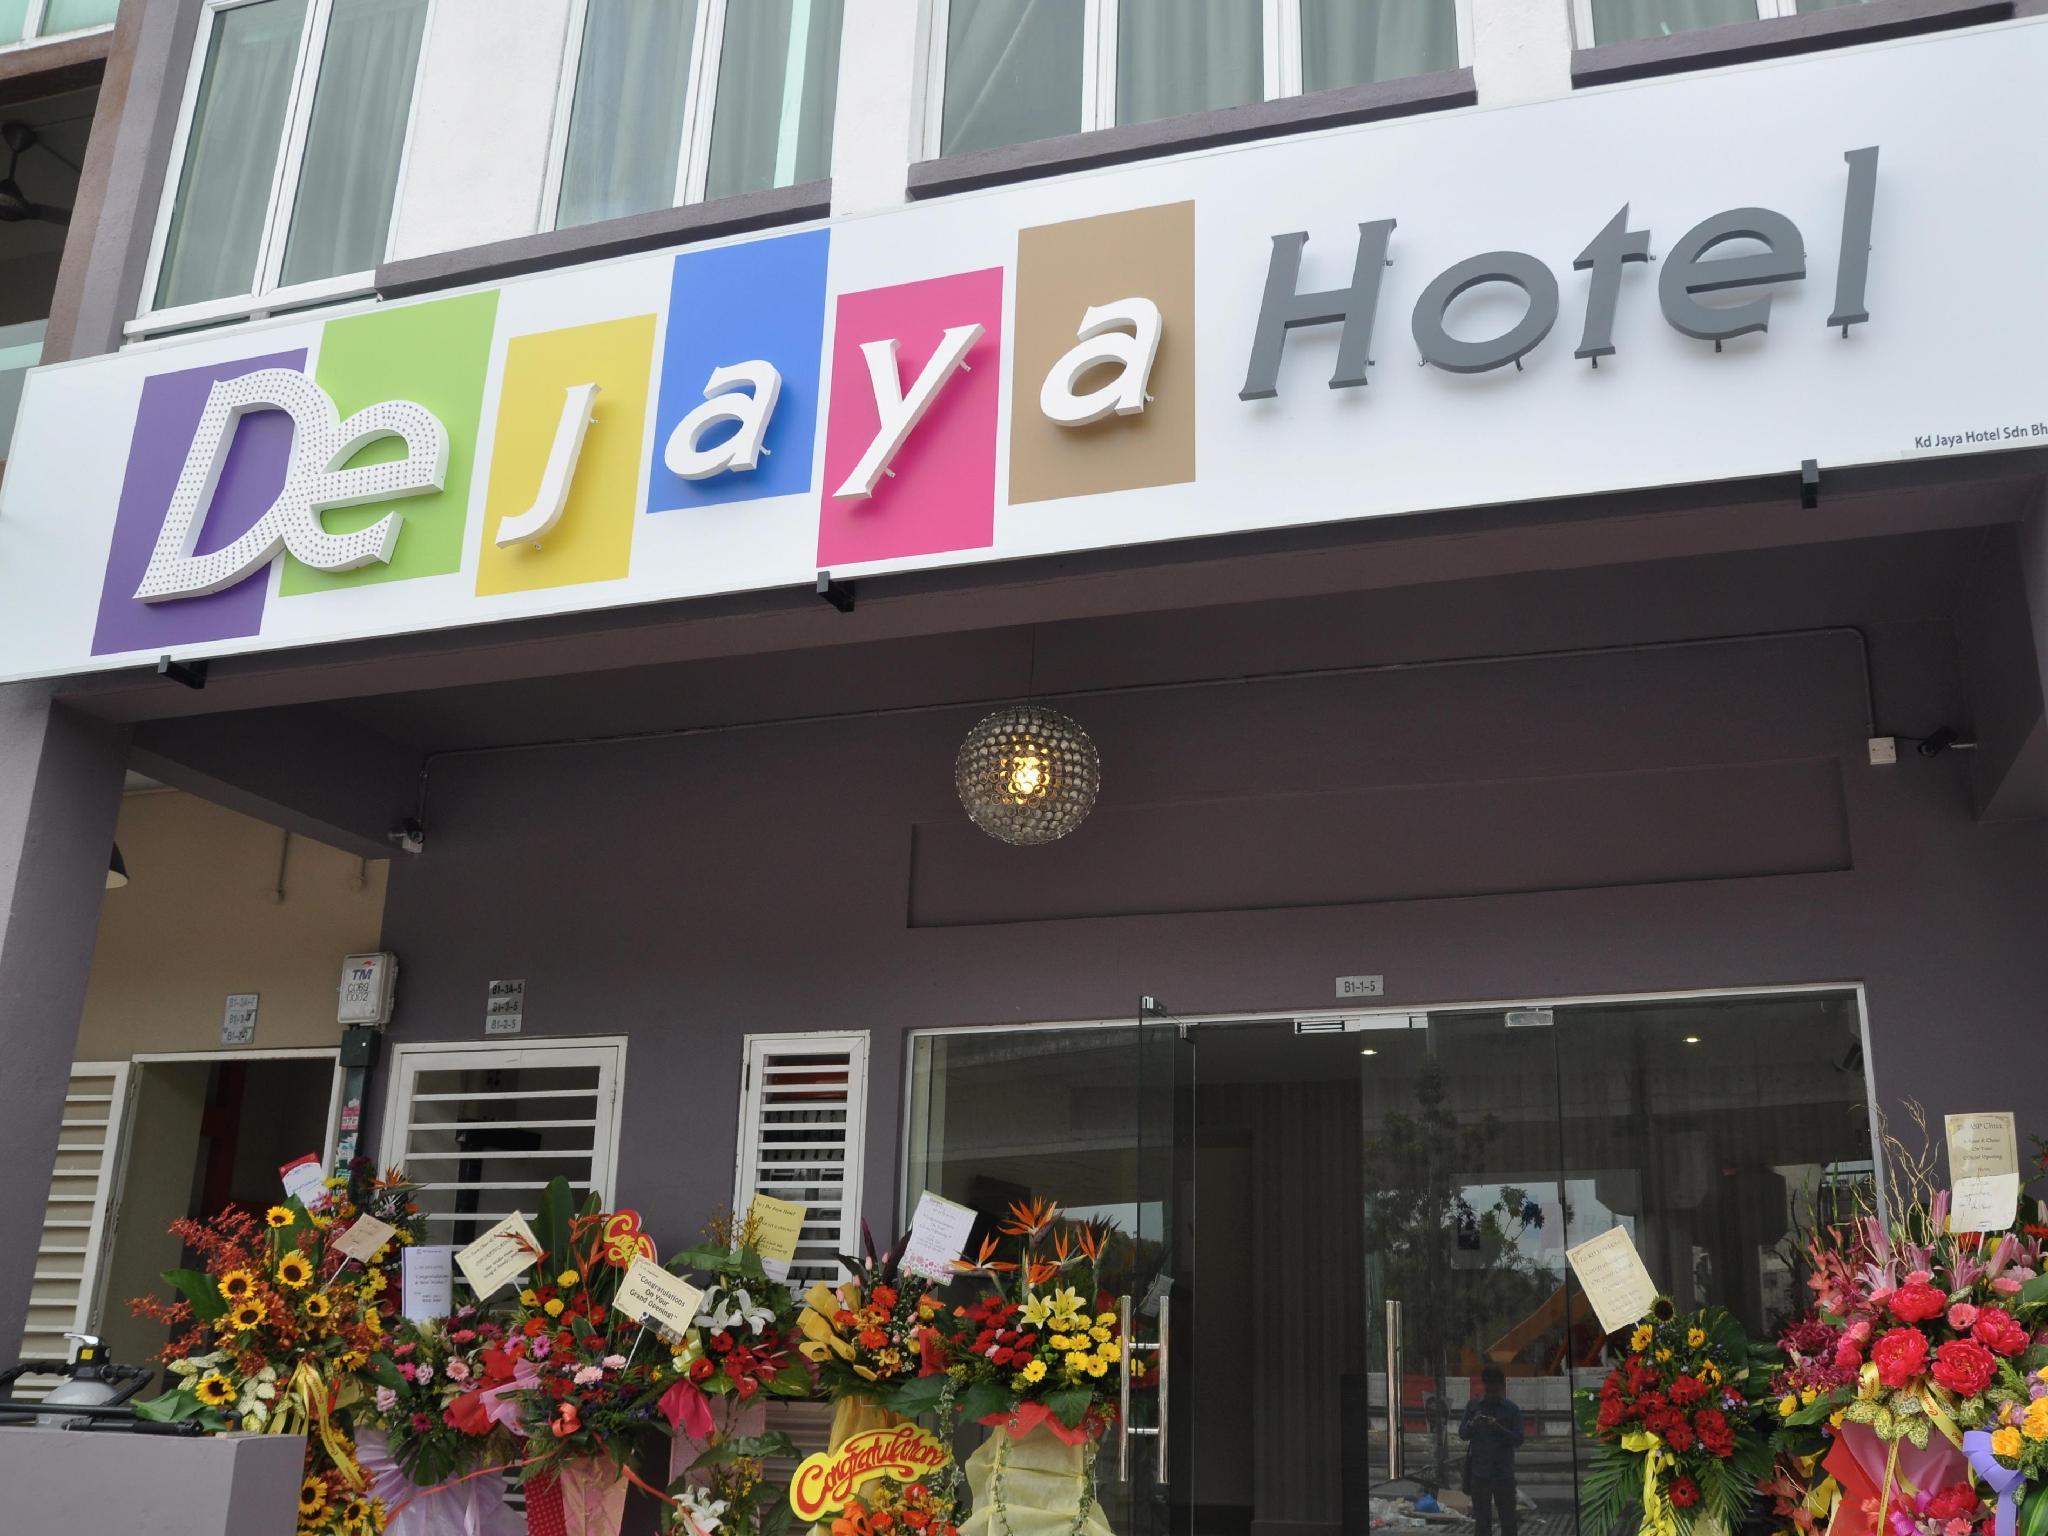 De Jaya Hotel Signature Park